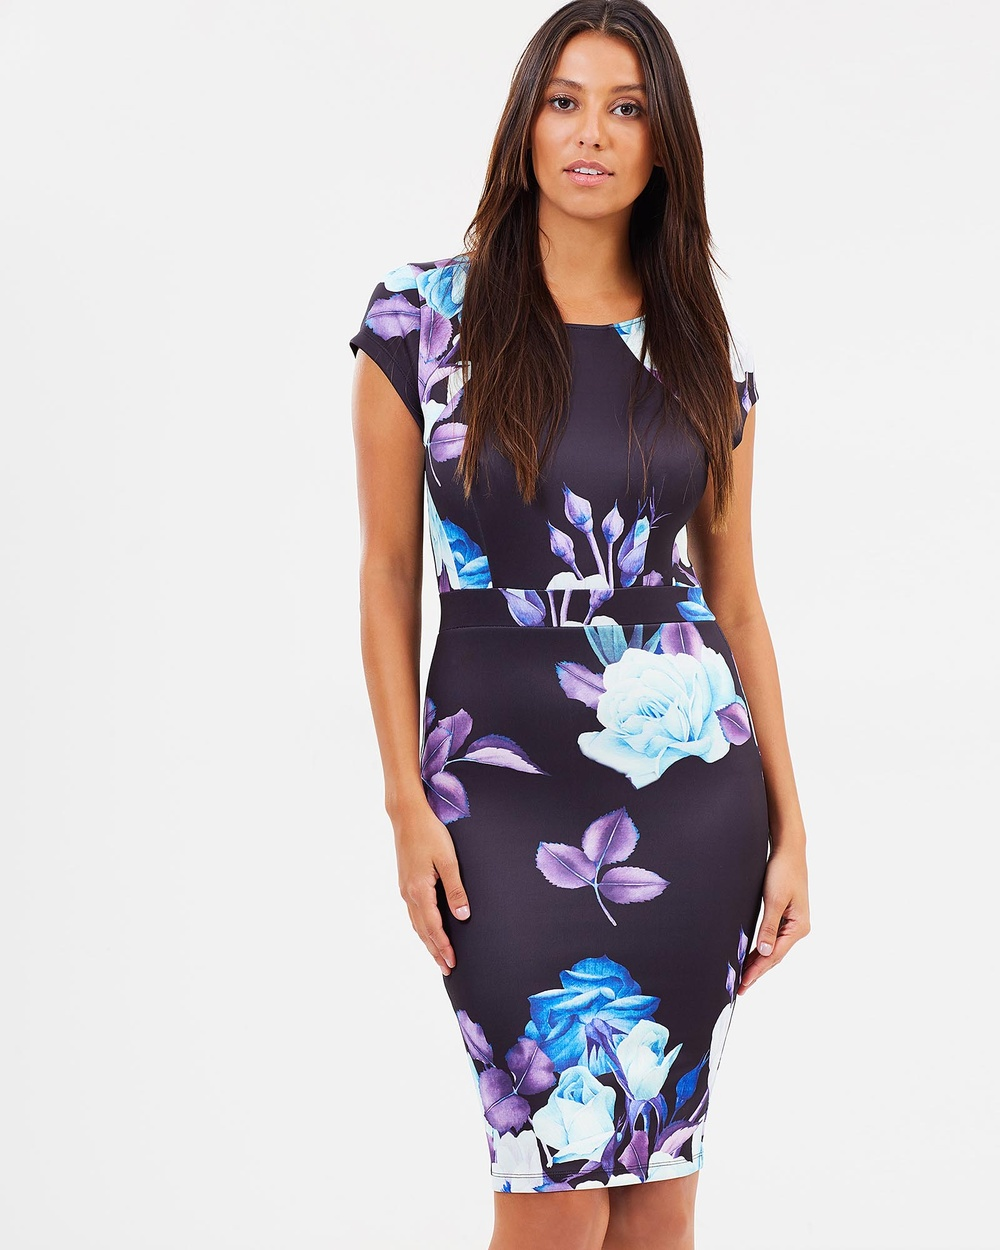 SKIVA Print Cap Sleeve Dress Printed Dresses Black Print Cap Sleeve Dress